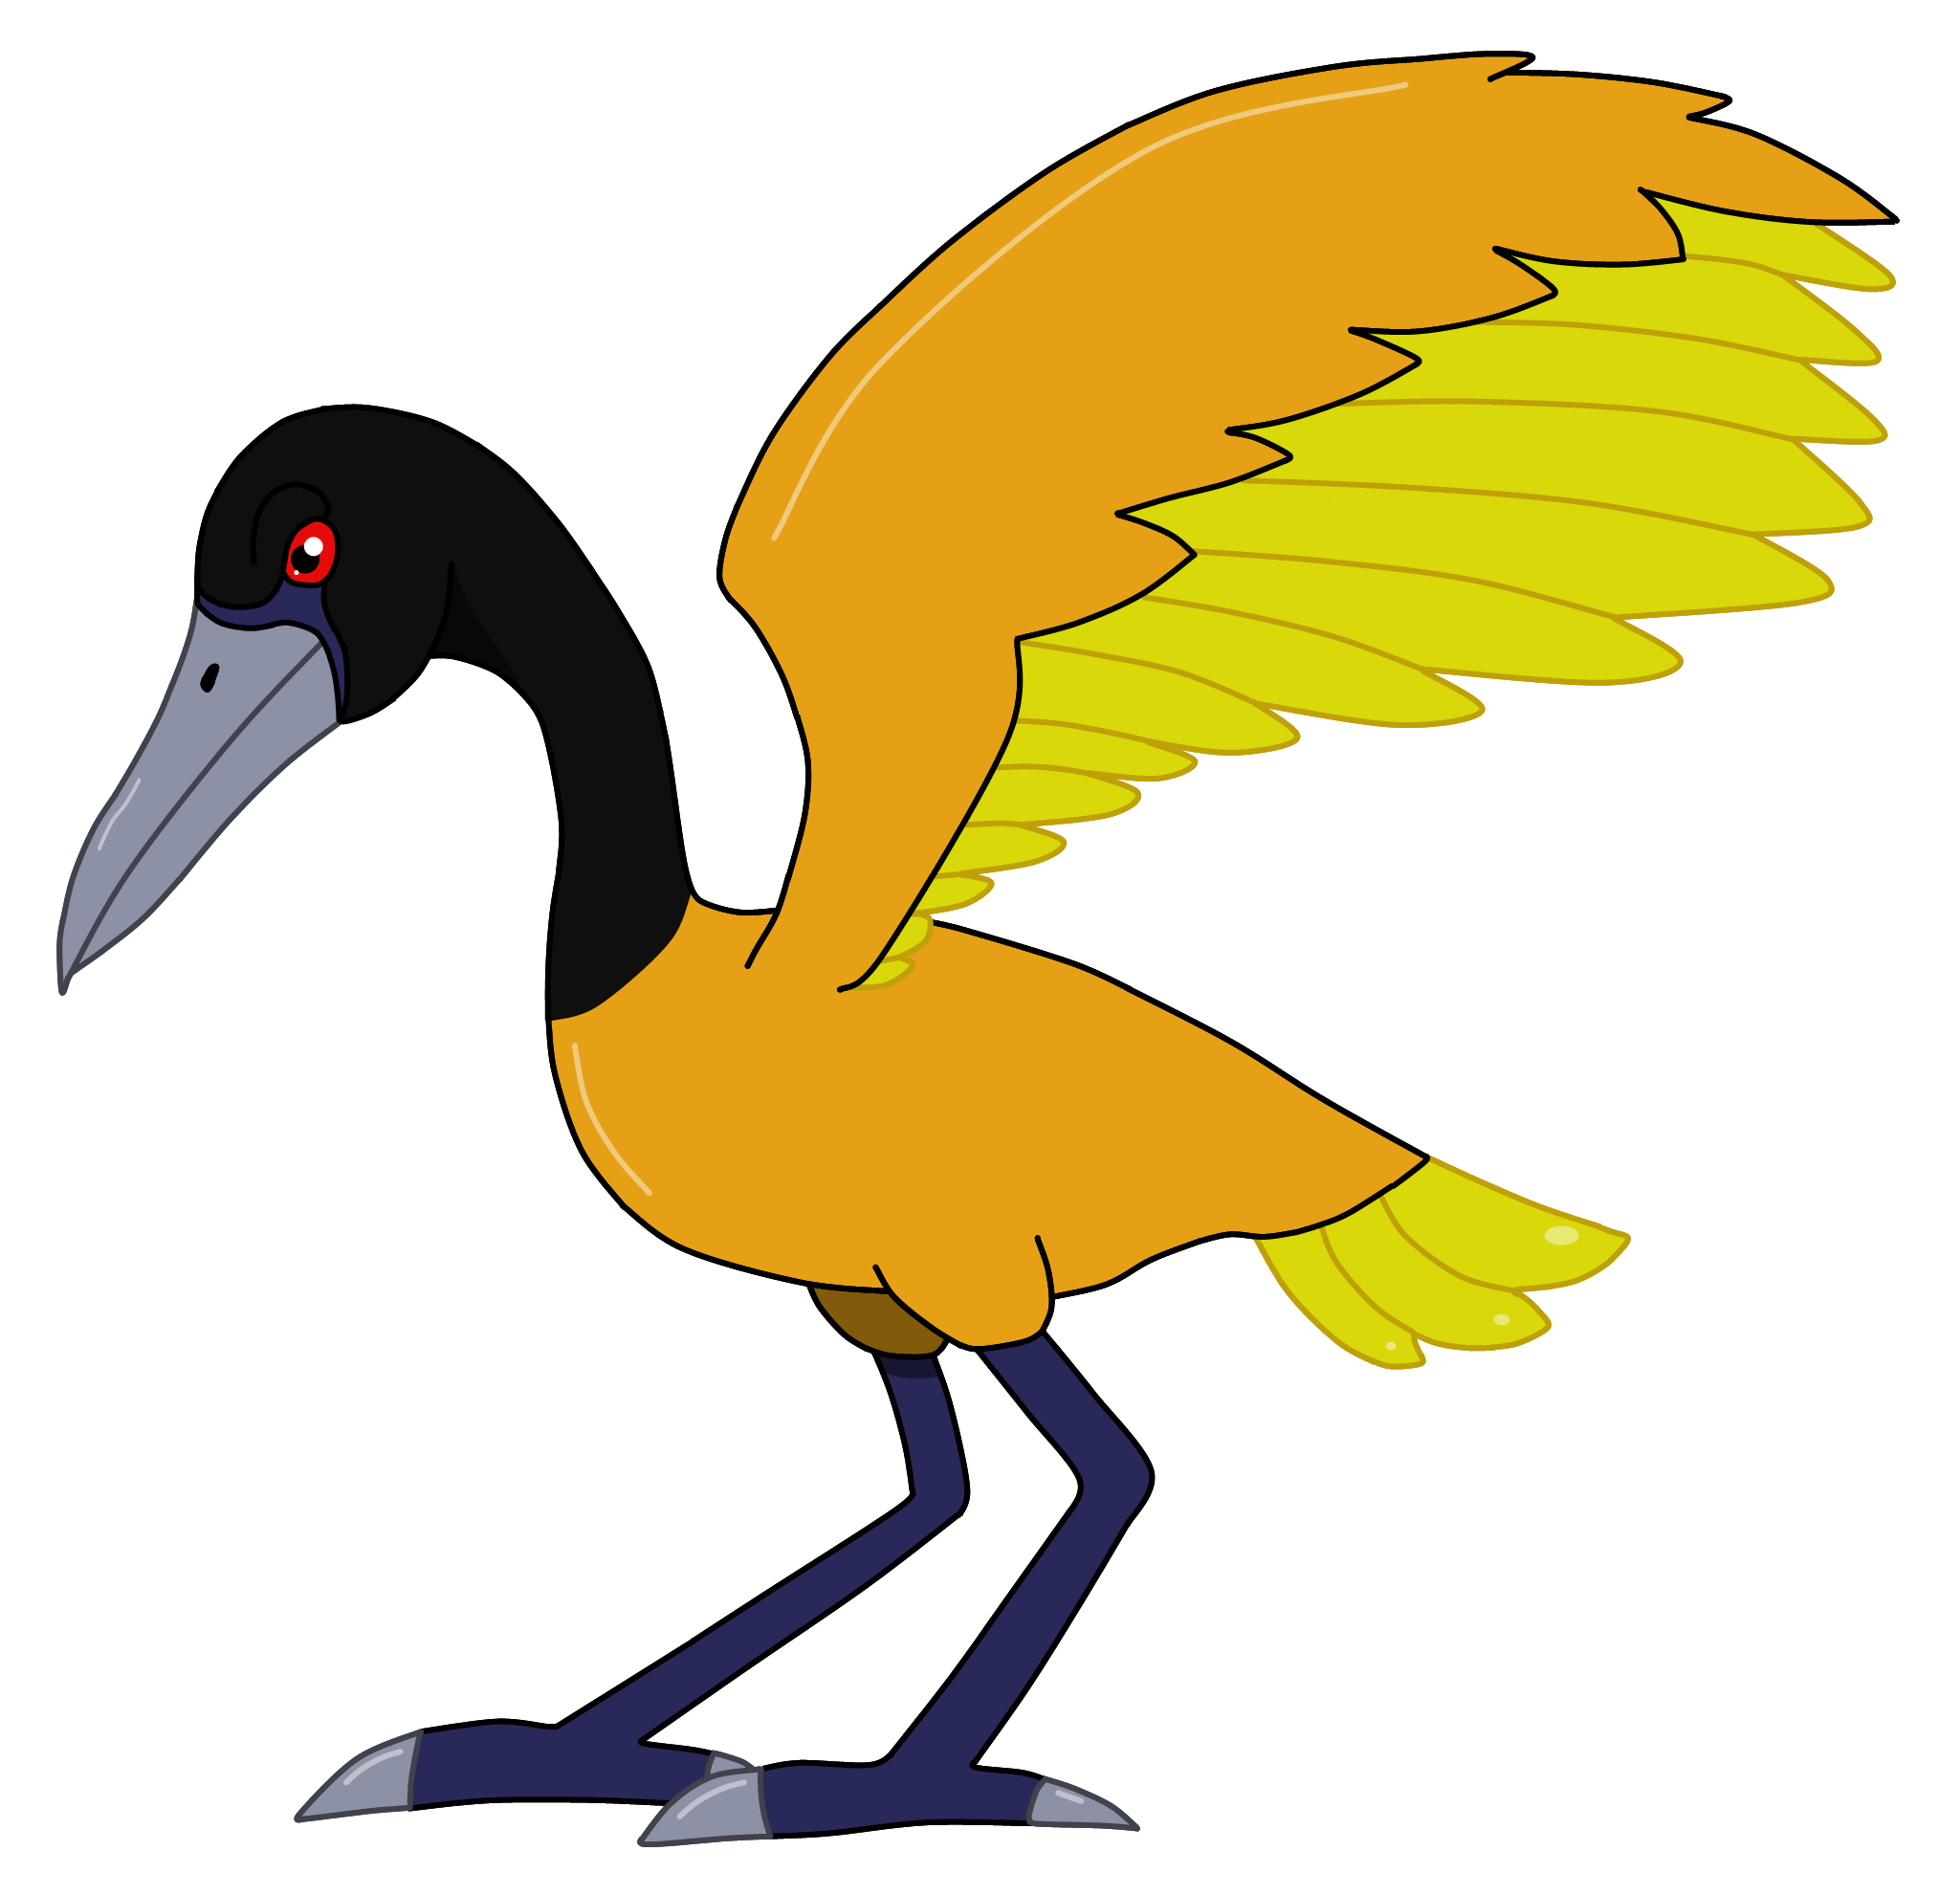 Stymphalian bird by cryoflaredraco. Crane clipart animal